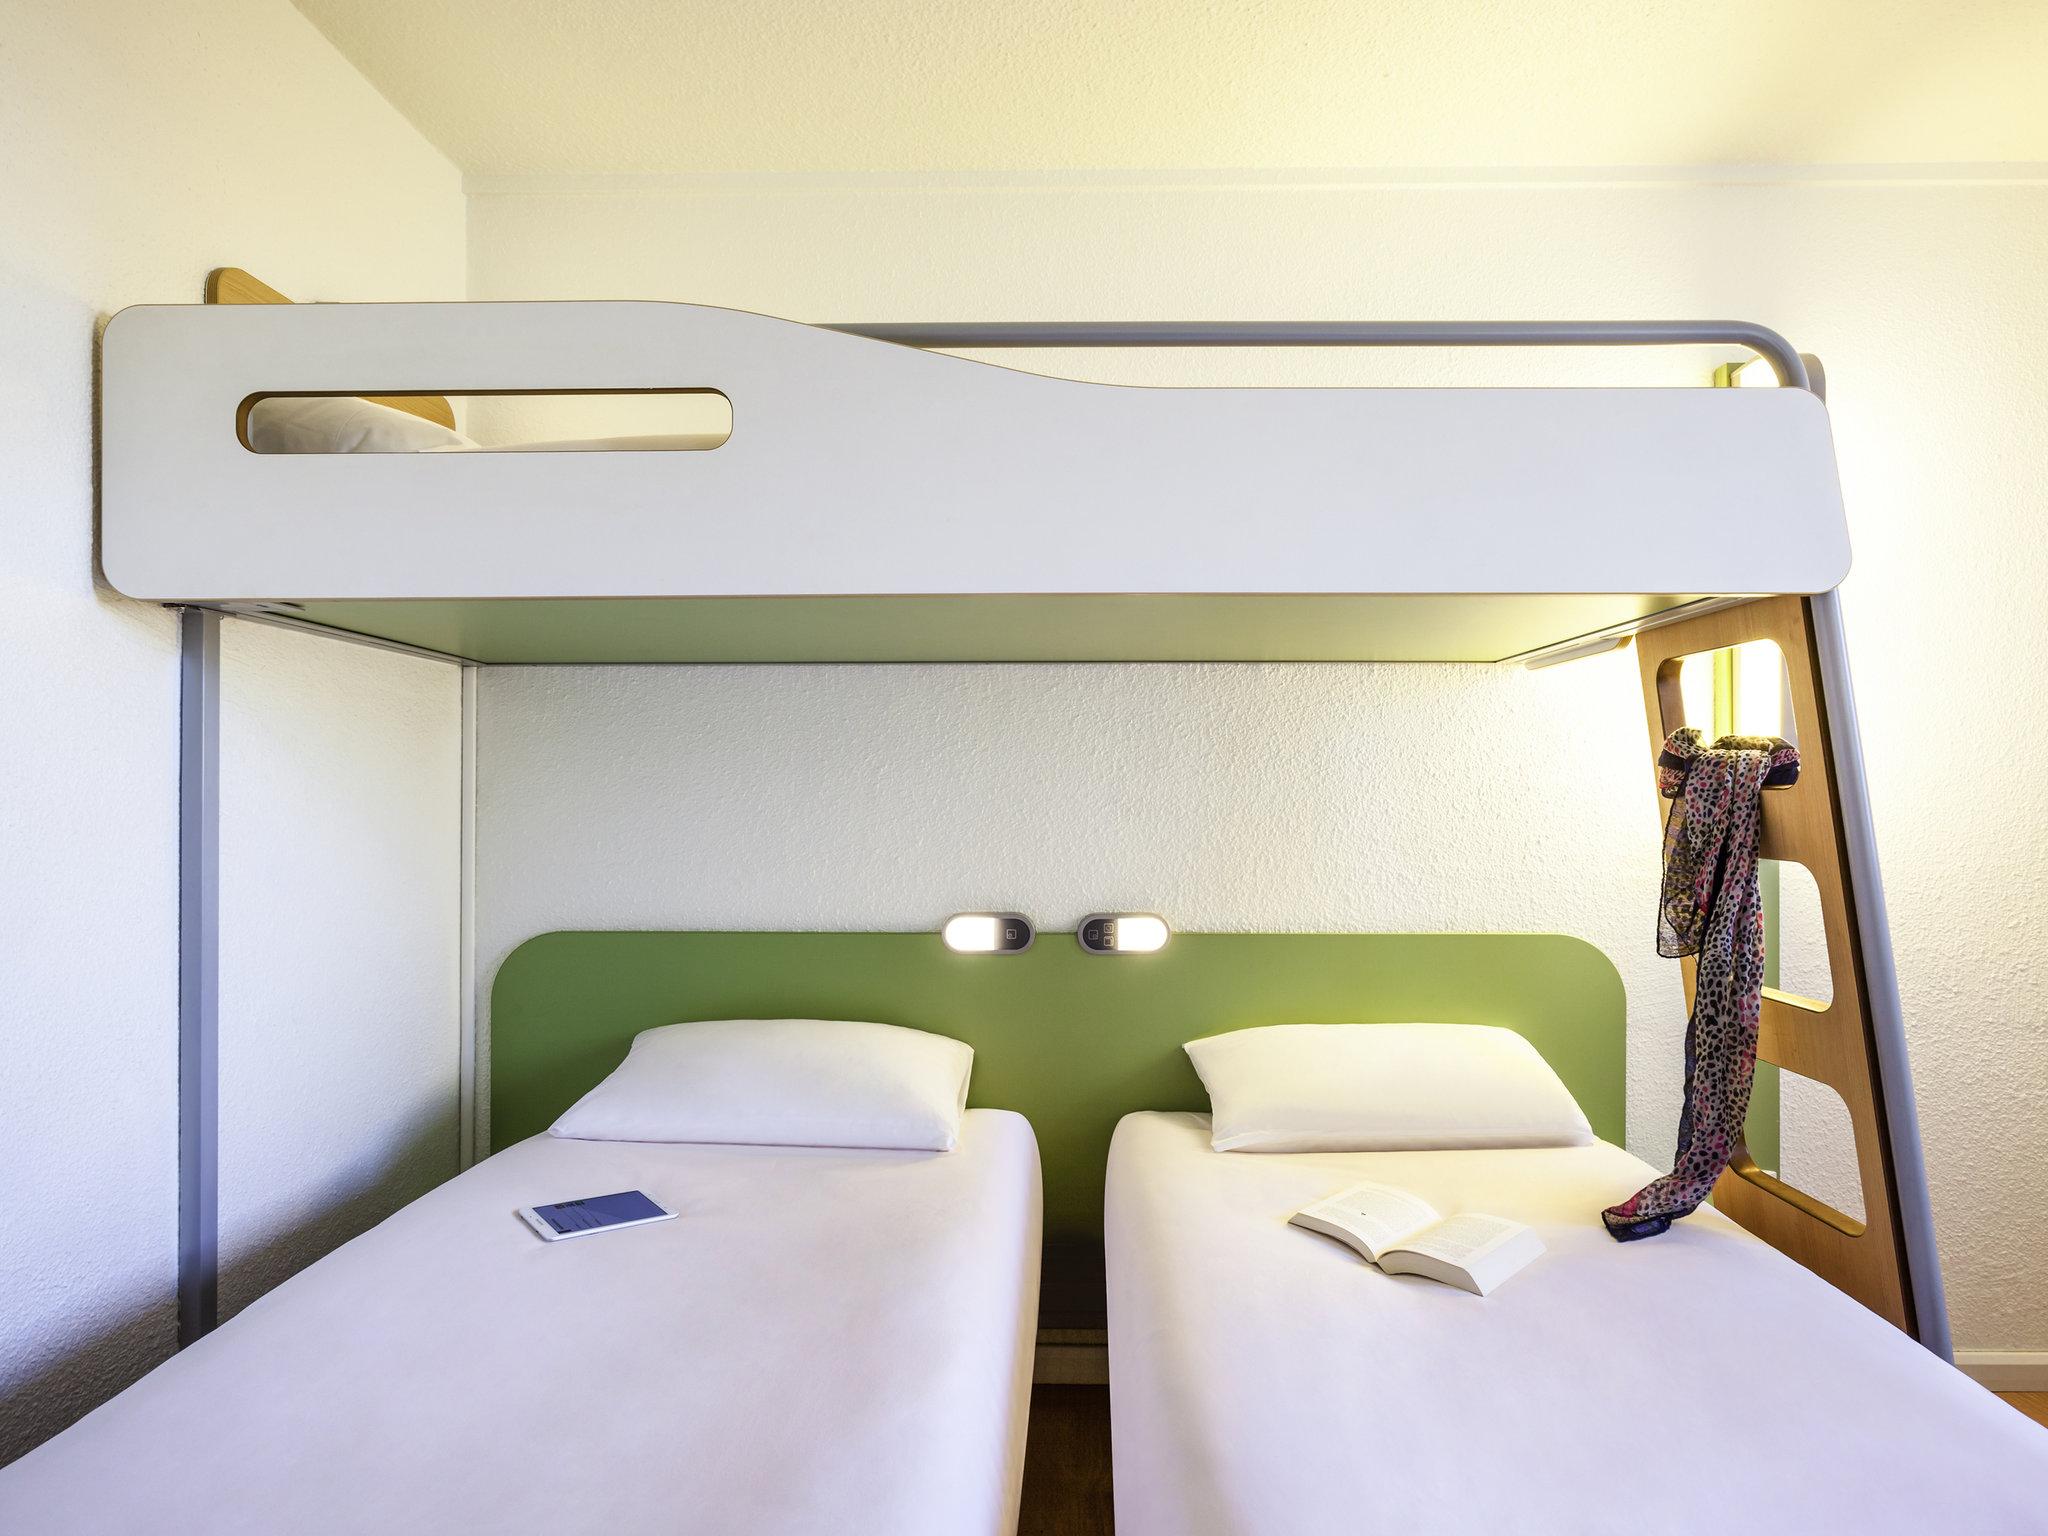 Hotel in bagnolet ibis budget paris porte de bagnolet - Gare routiere paris gallieni porte bagnolet ...